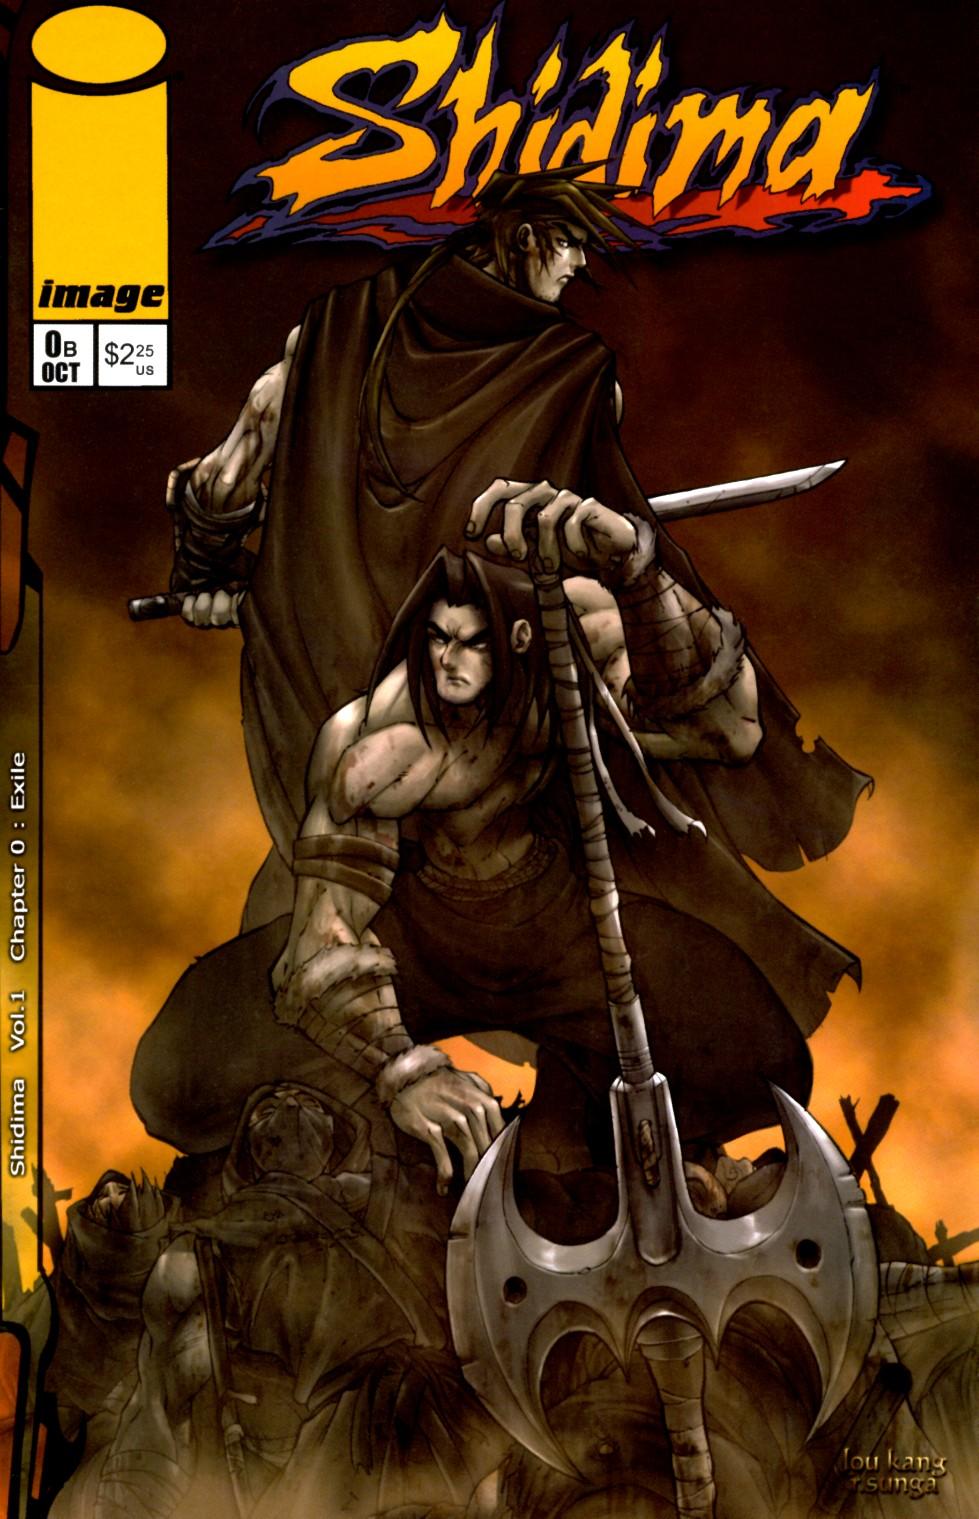 Read online Shidima comic -  Issue #0 - 1